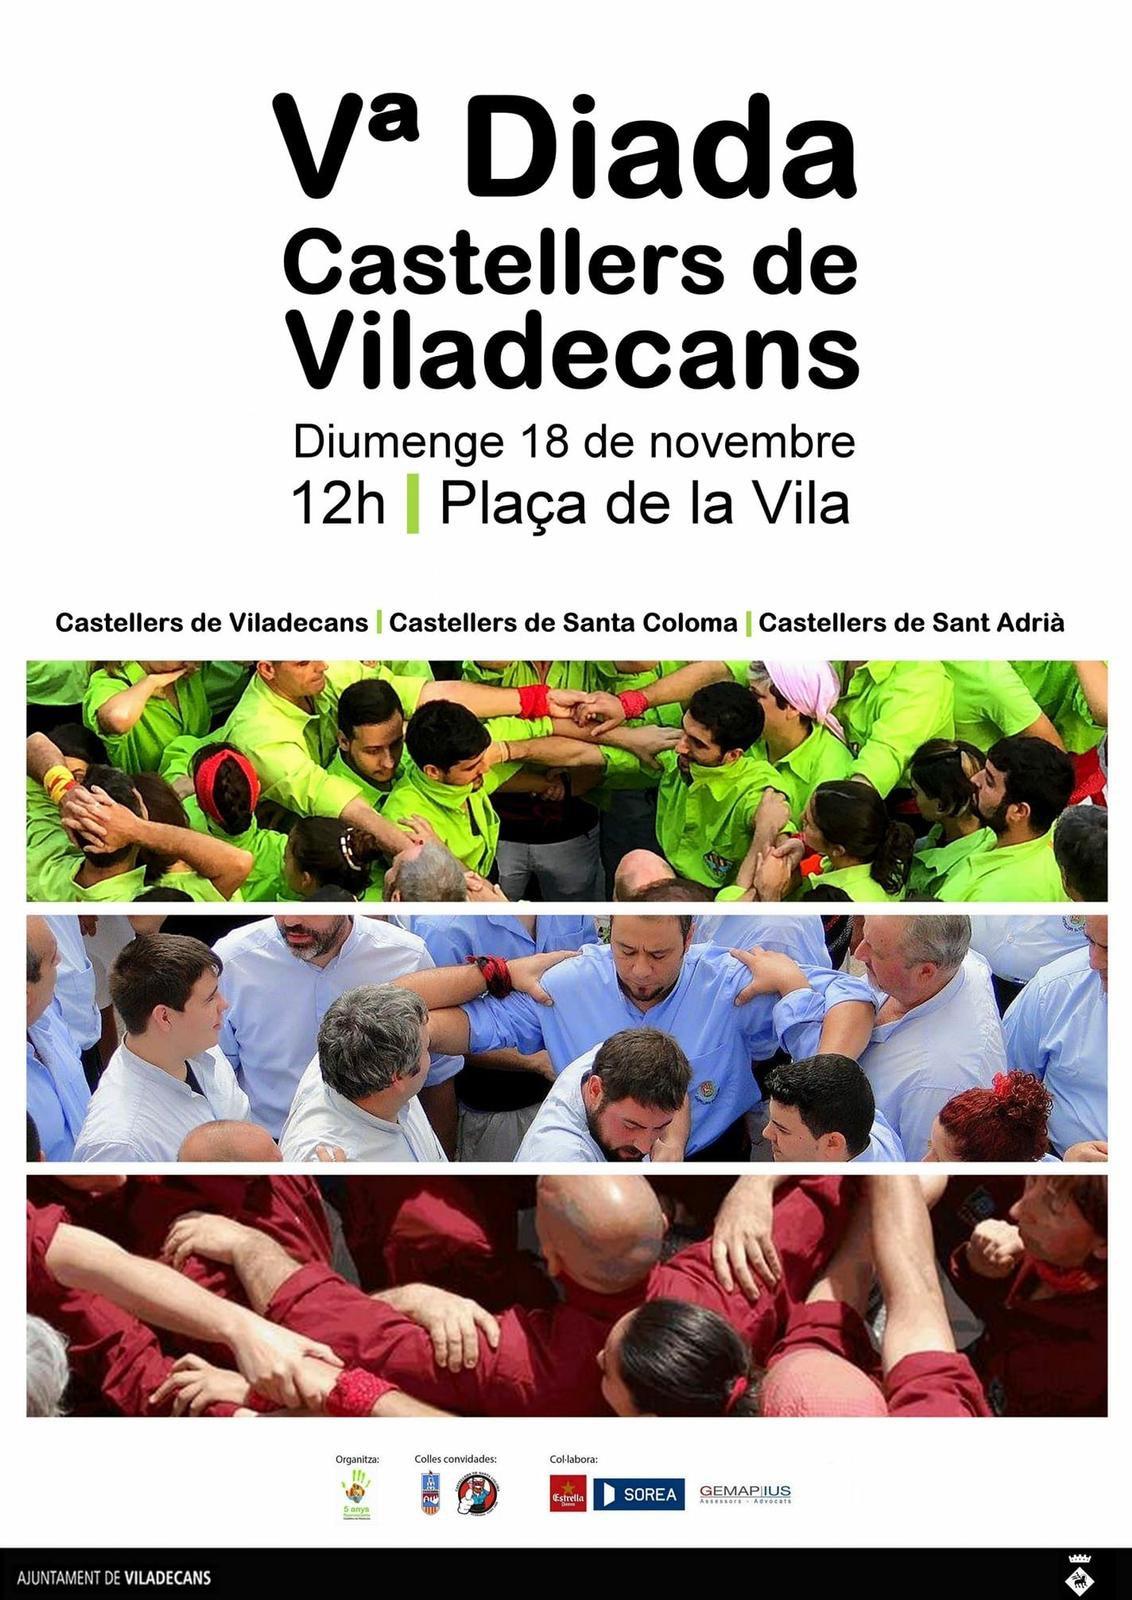 Castellers de Viladecans